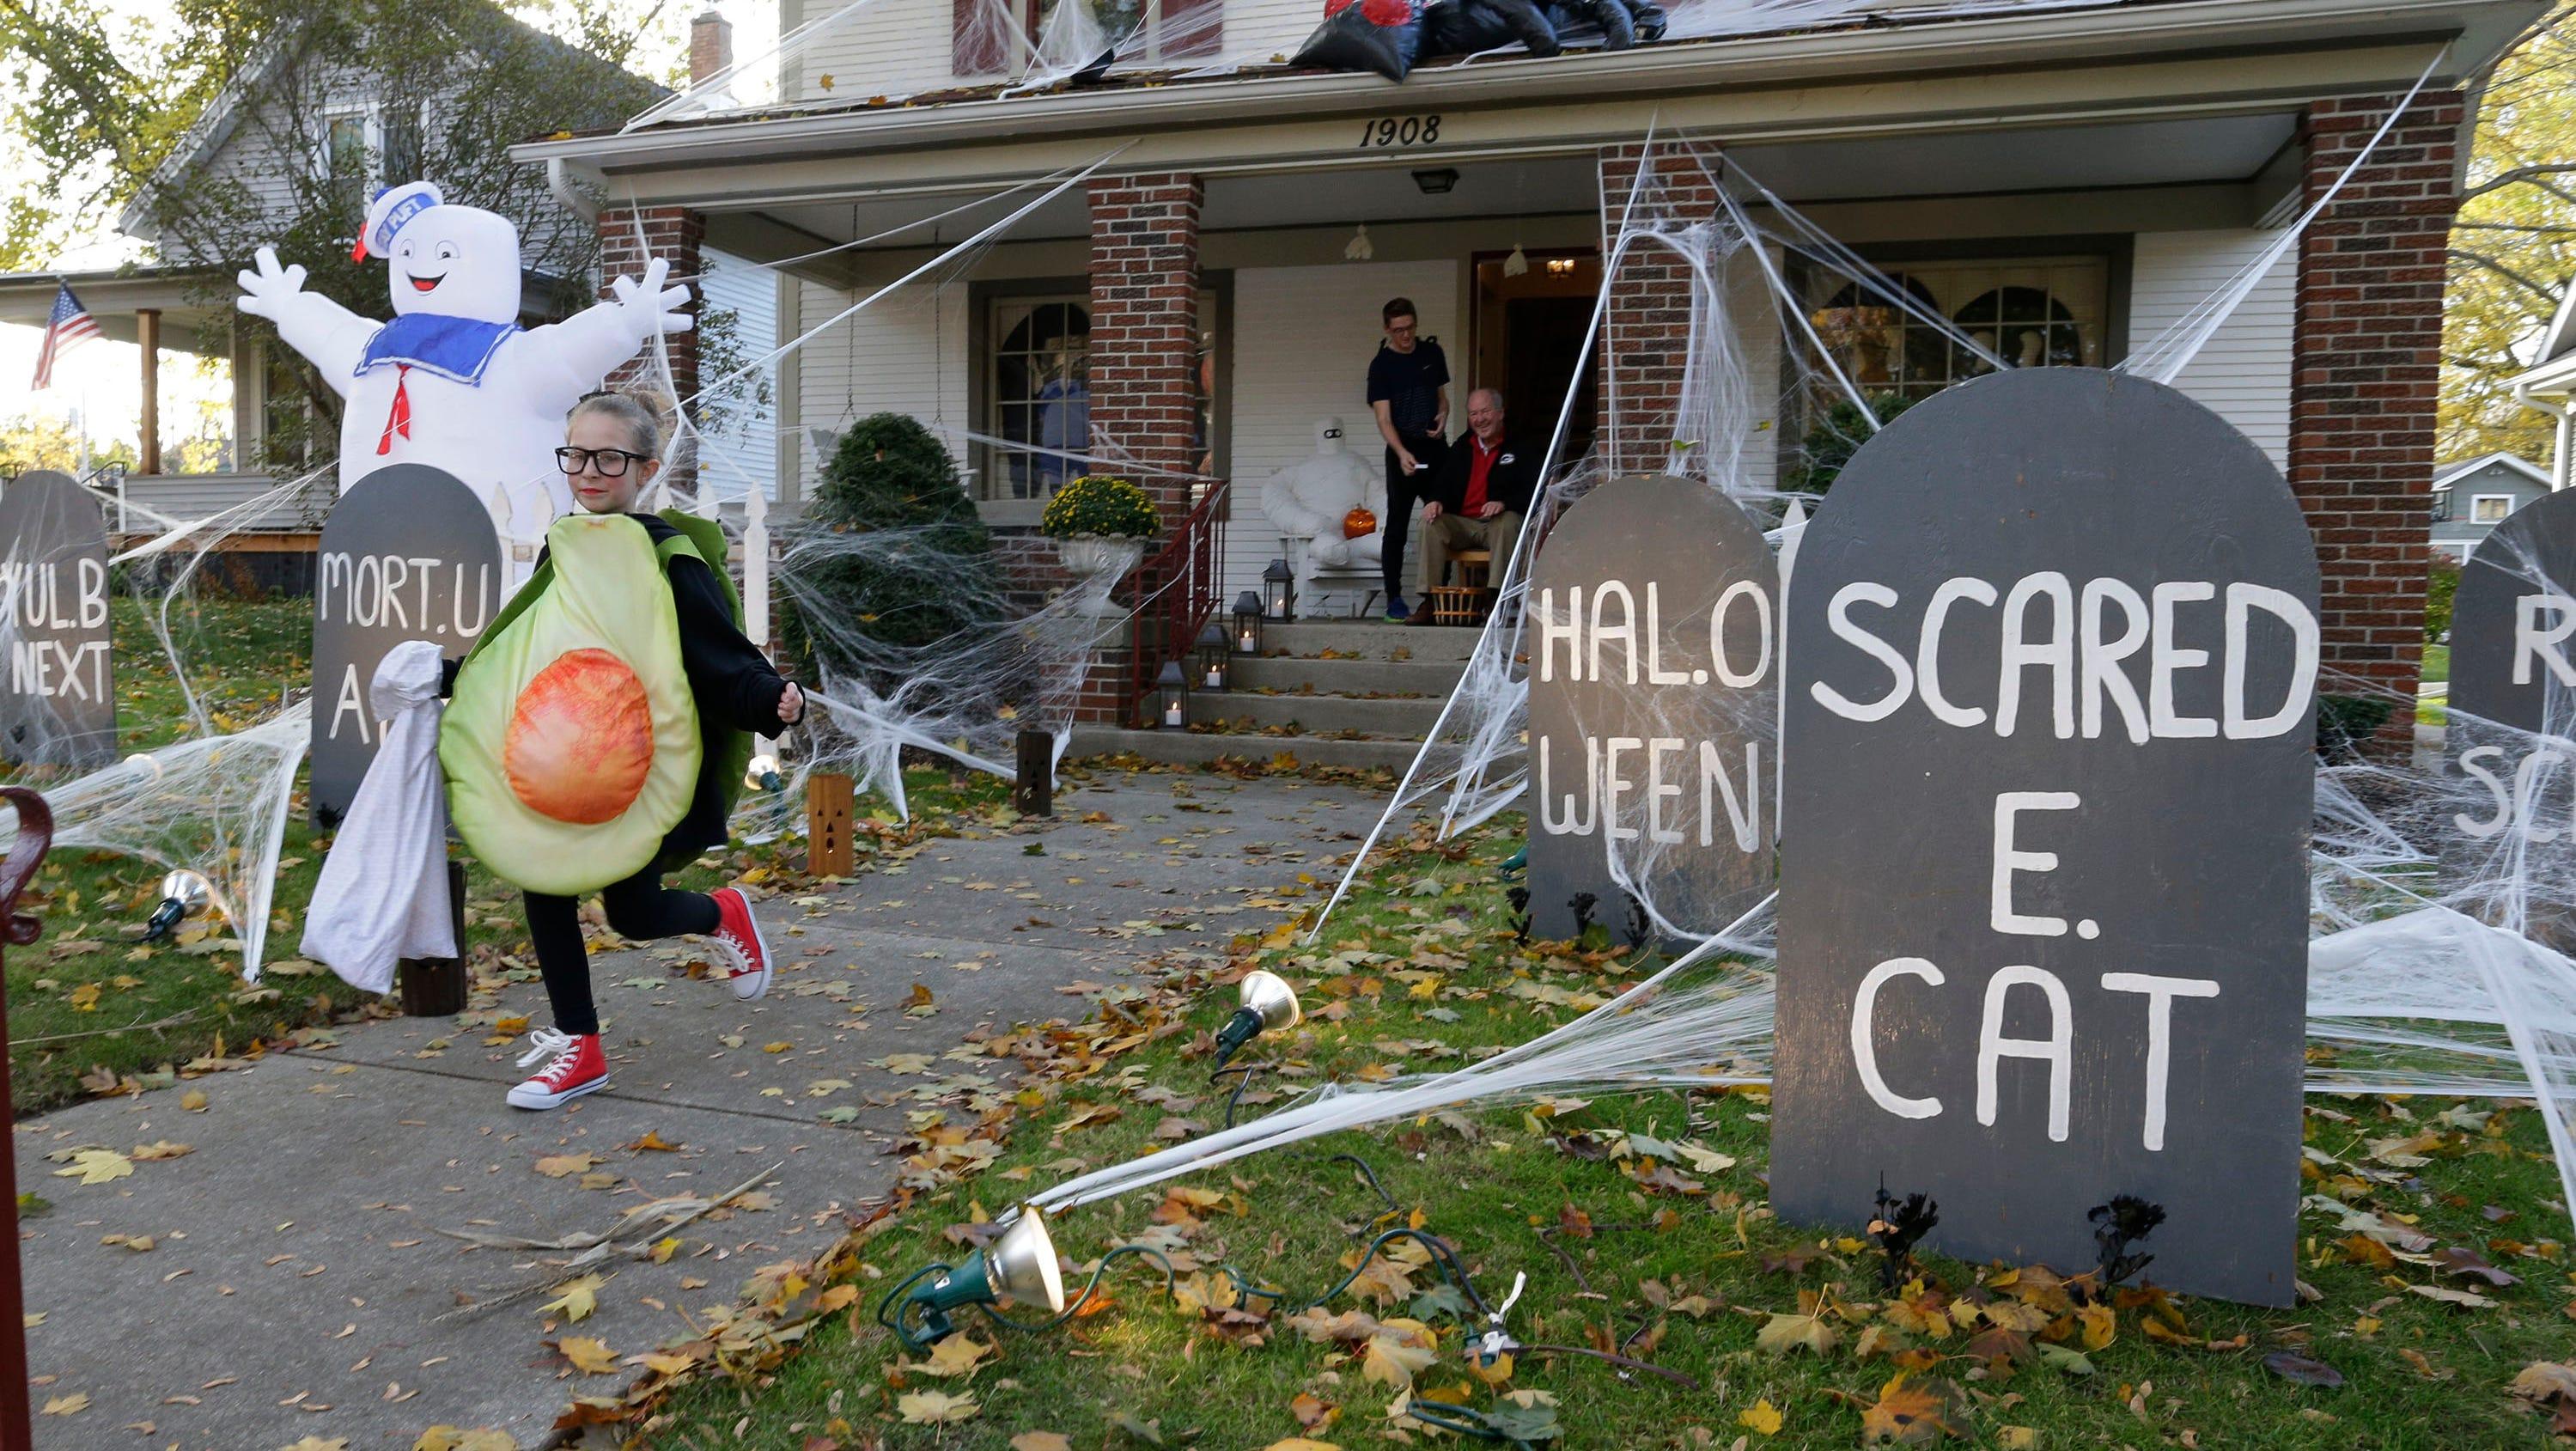 Sheboygan Halloween 2020 Sheboygan County trick or treat 2020 goes on amid coronavirus pandemic